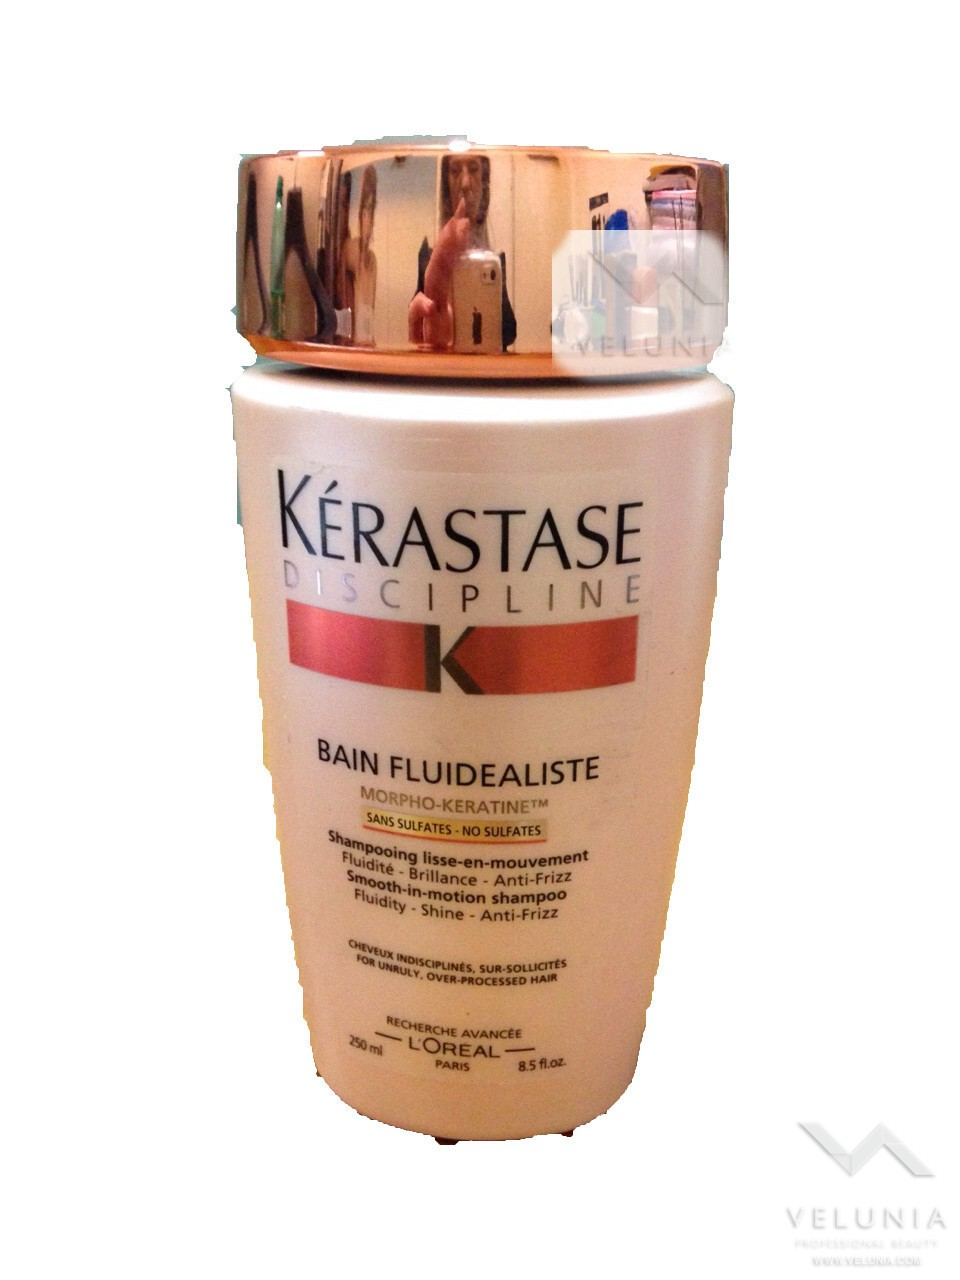 l'oreal Kerastase discipline shampoo fluidealiste anti crespo 250 ml 1